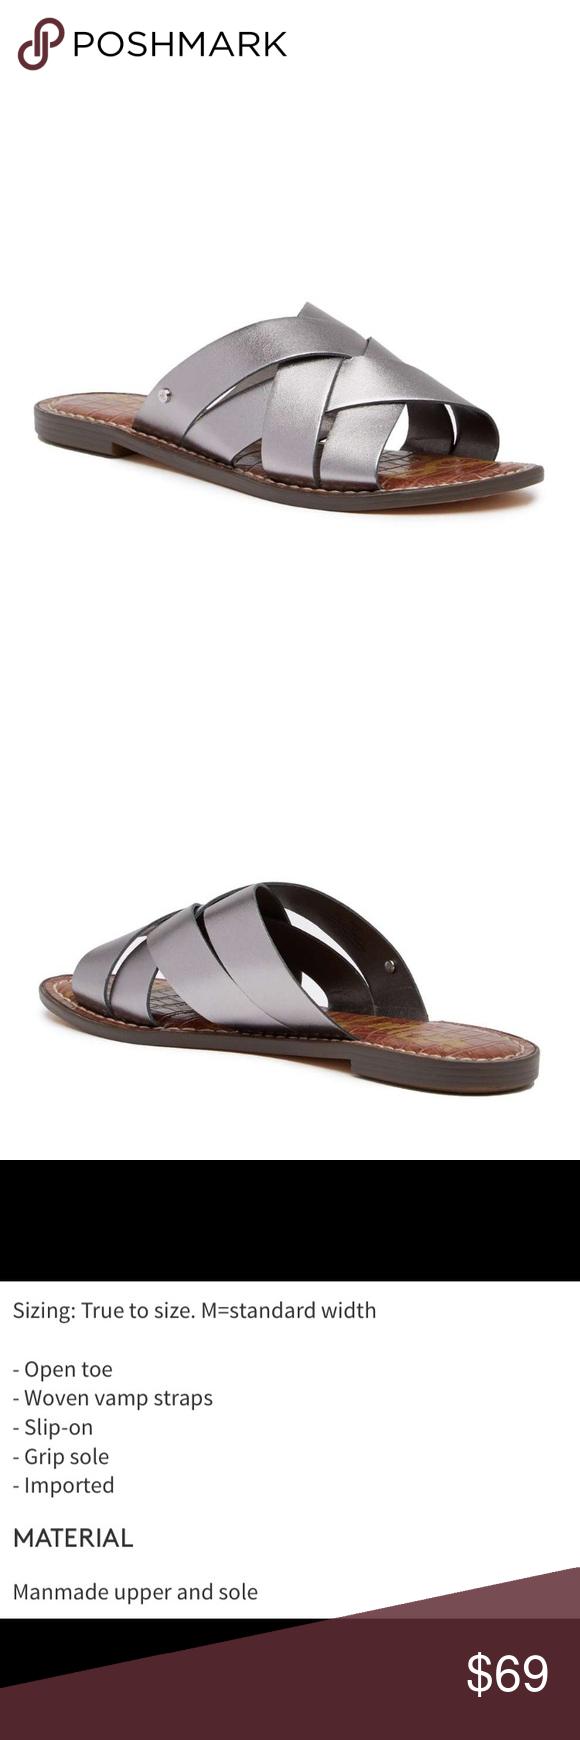 2d84e4adfba0 NIB Sam Edelman Gaile Slide Sandal New in Box Sam Edelman Gaile Slide  Sandal Color